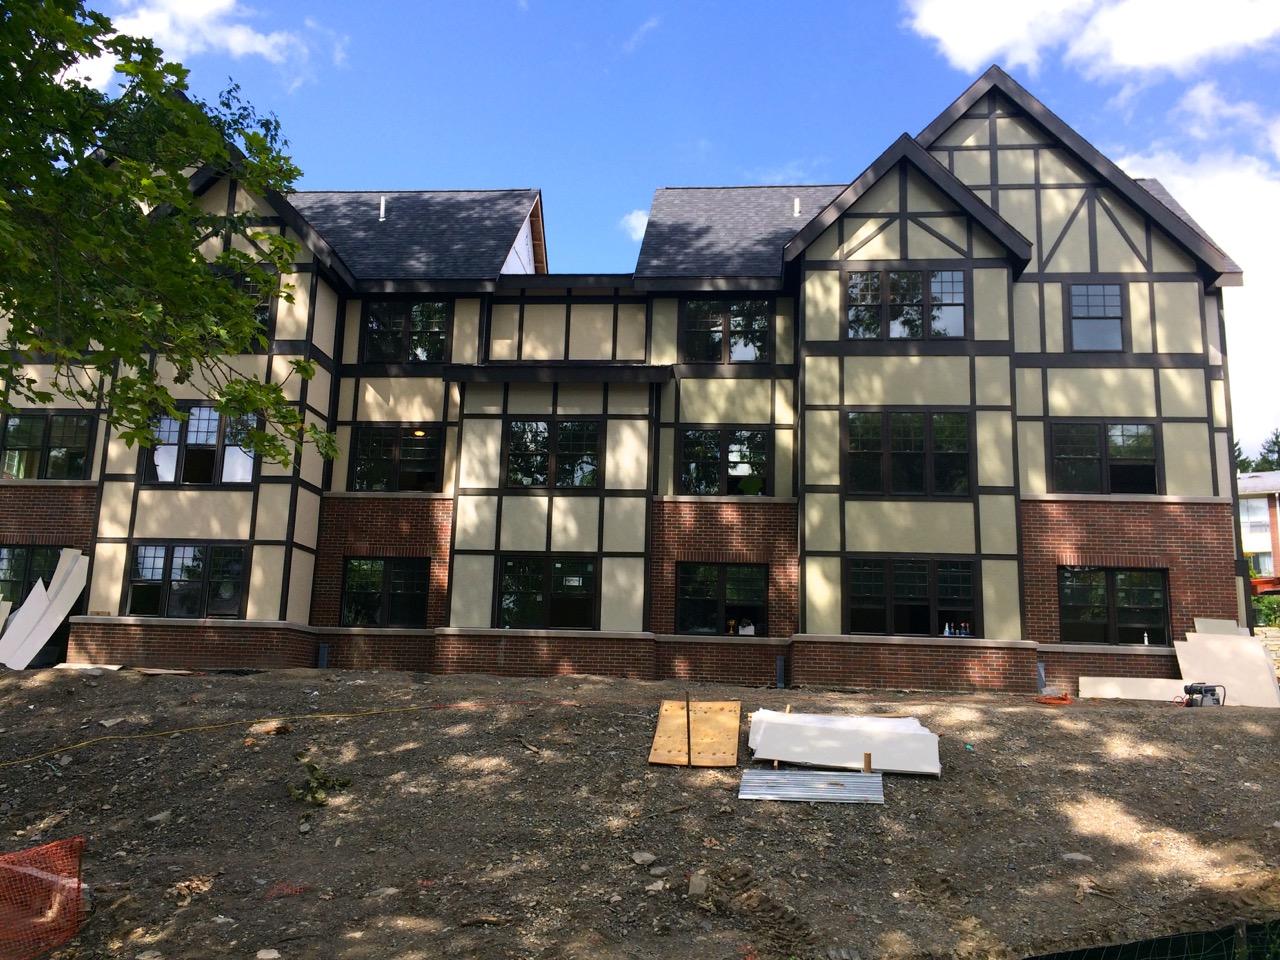 Thurston-Ave-Apartments-IthacaBuilds-08141408